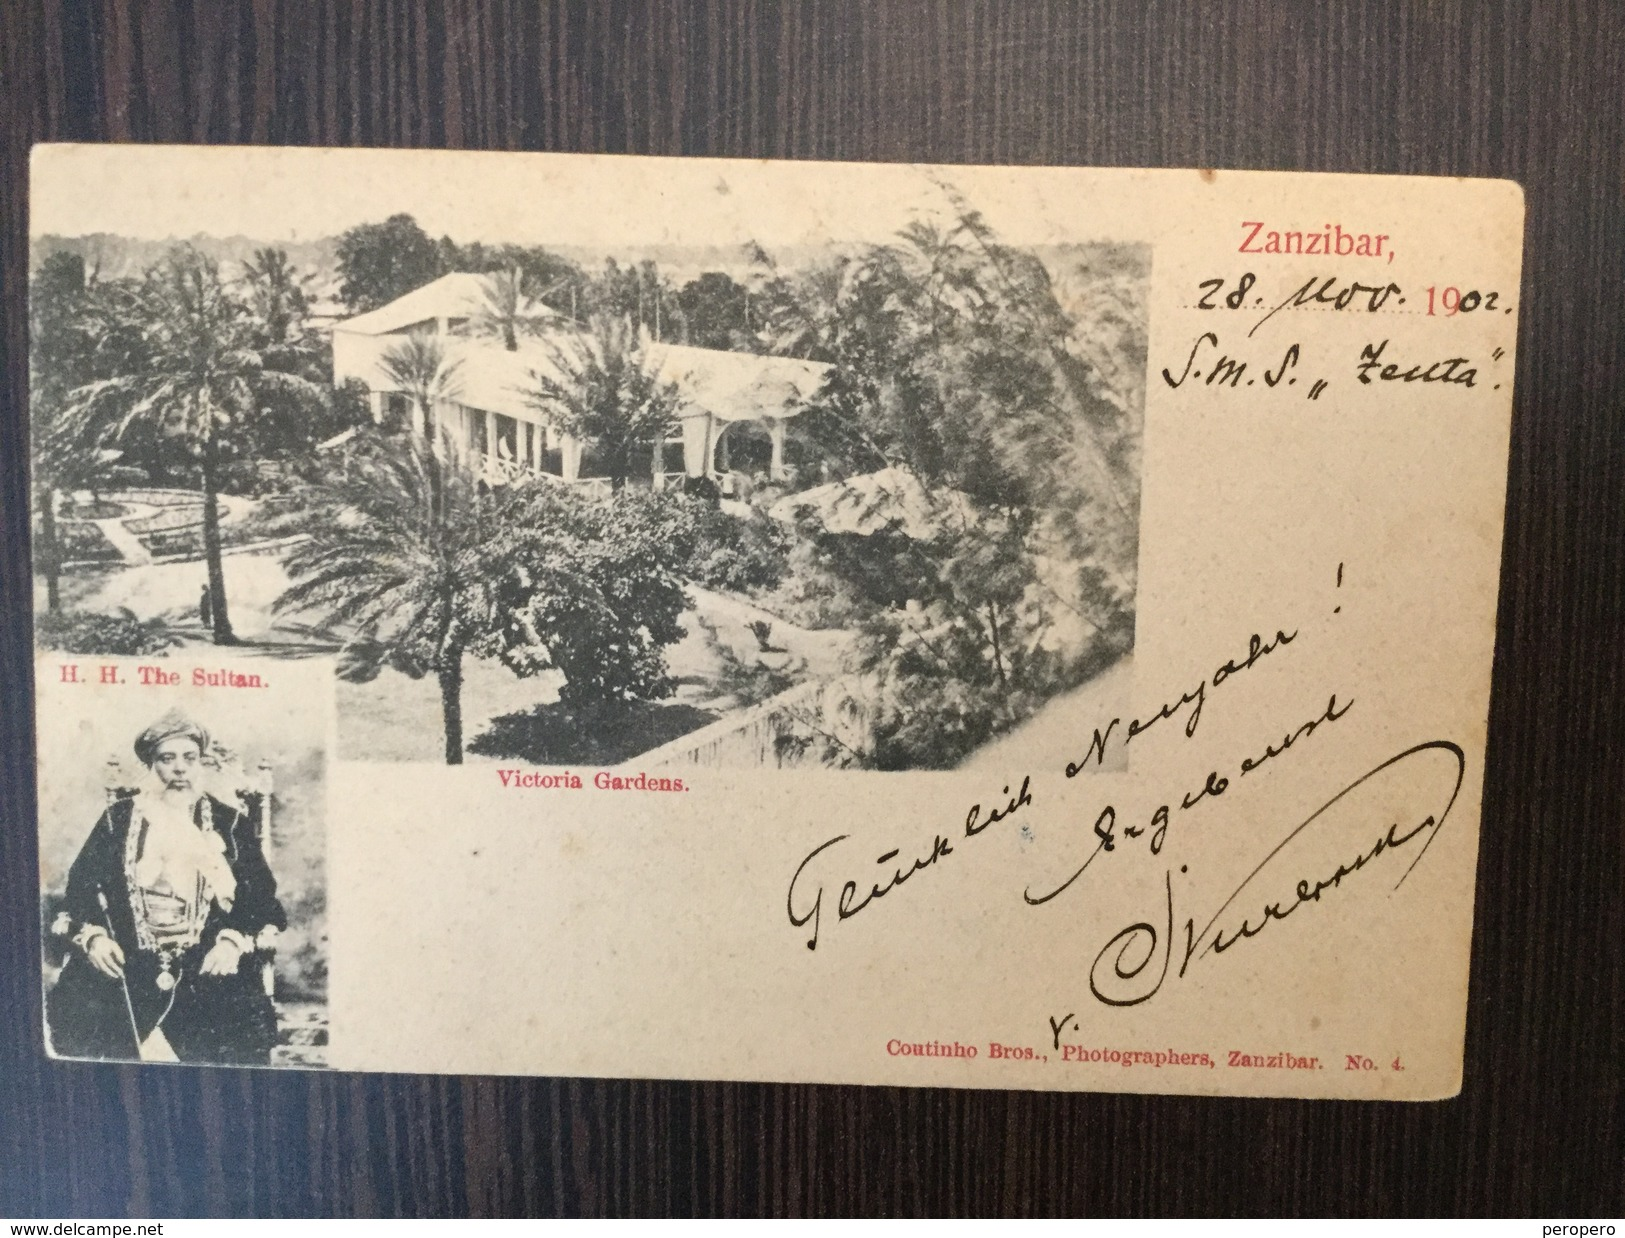 AK  ZANZIBAR   TANZANIA   H.H. THE SULTAN    1902. - Tansania